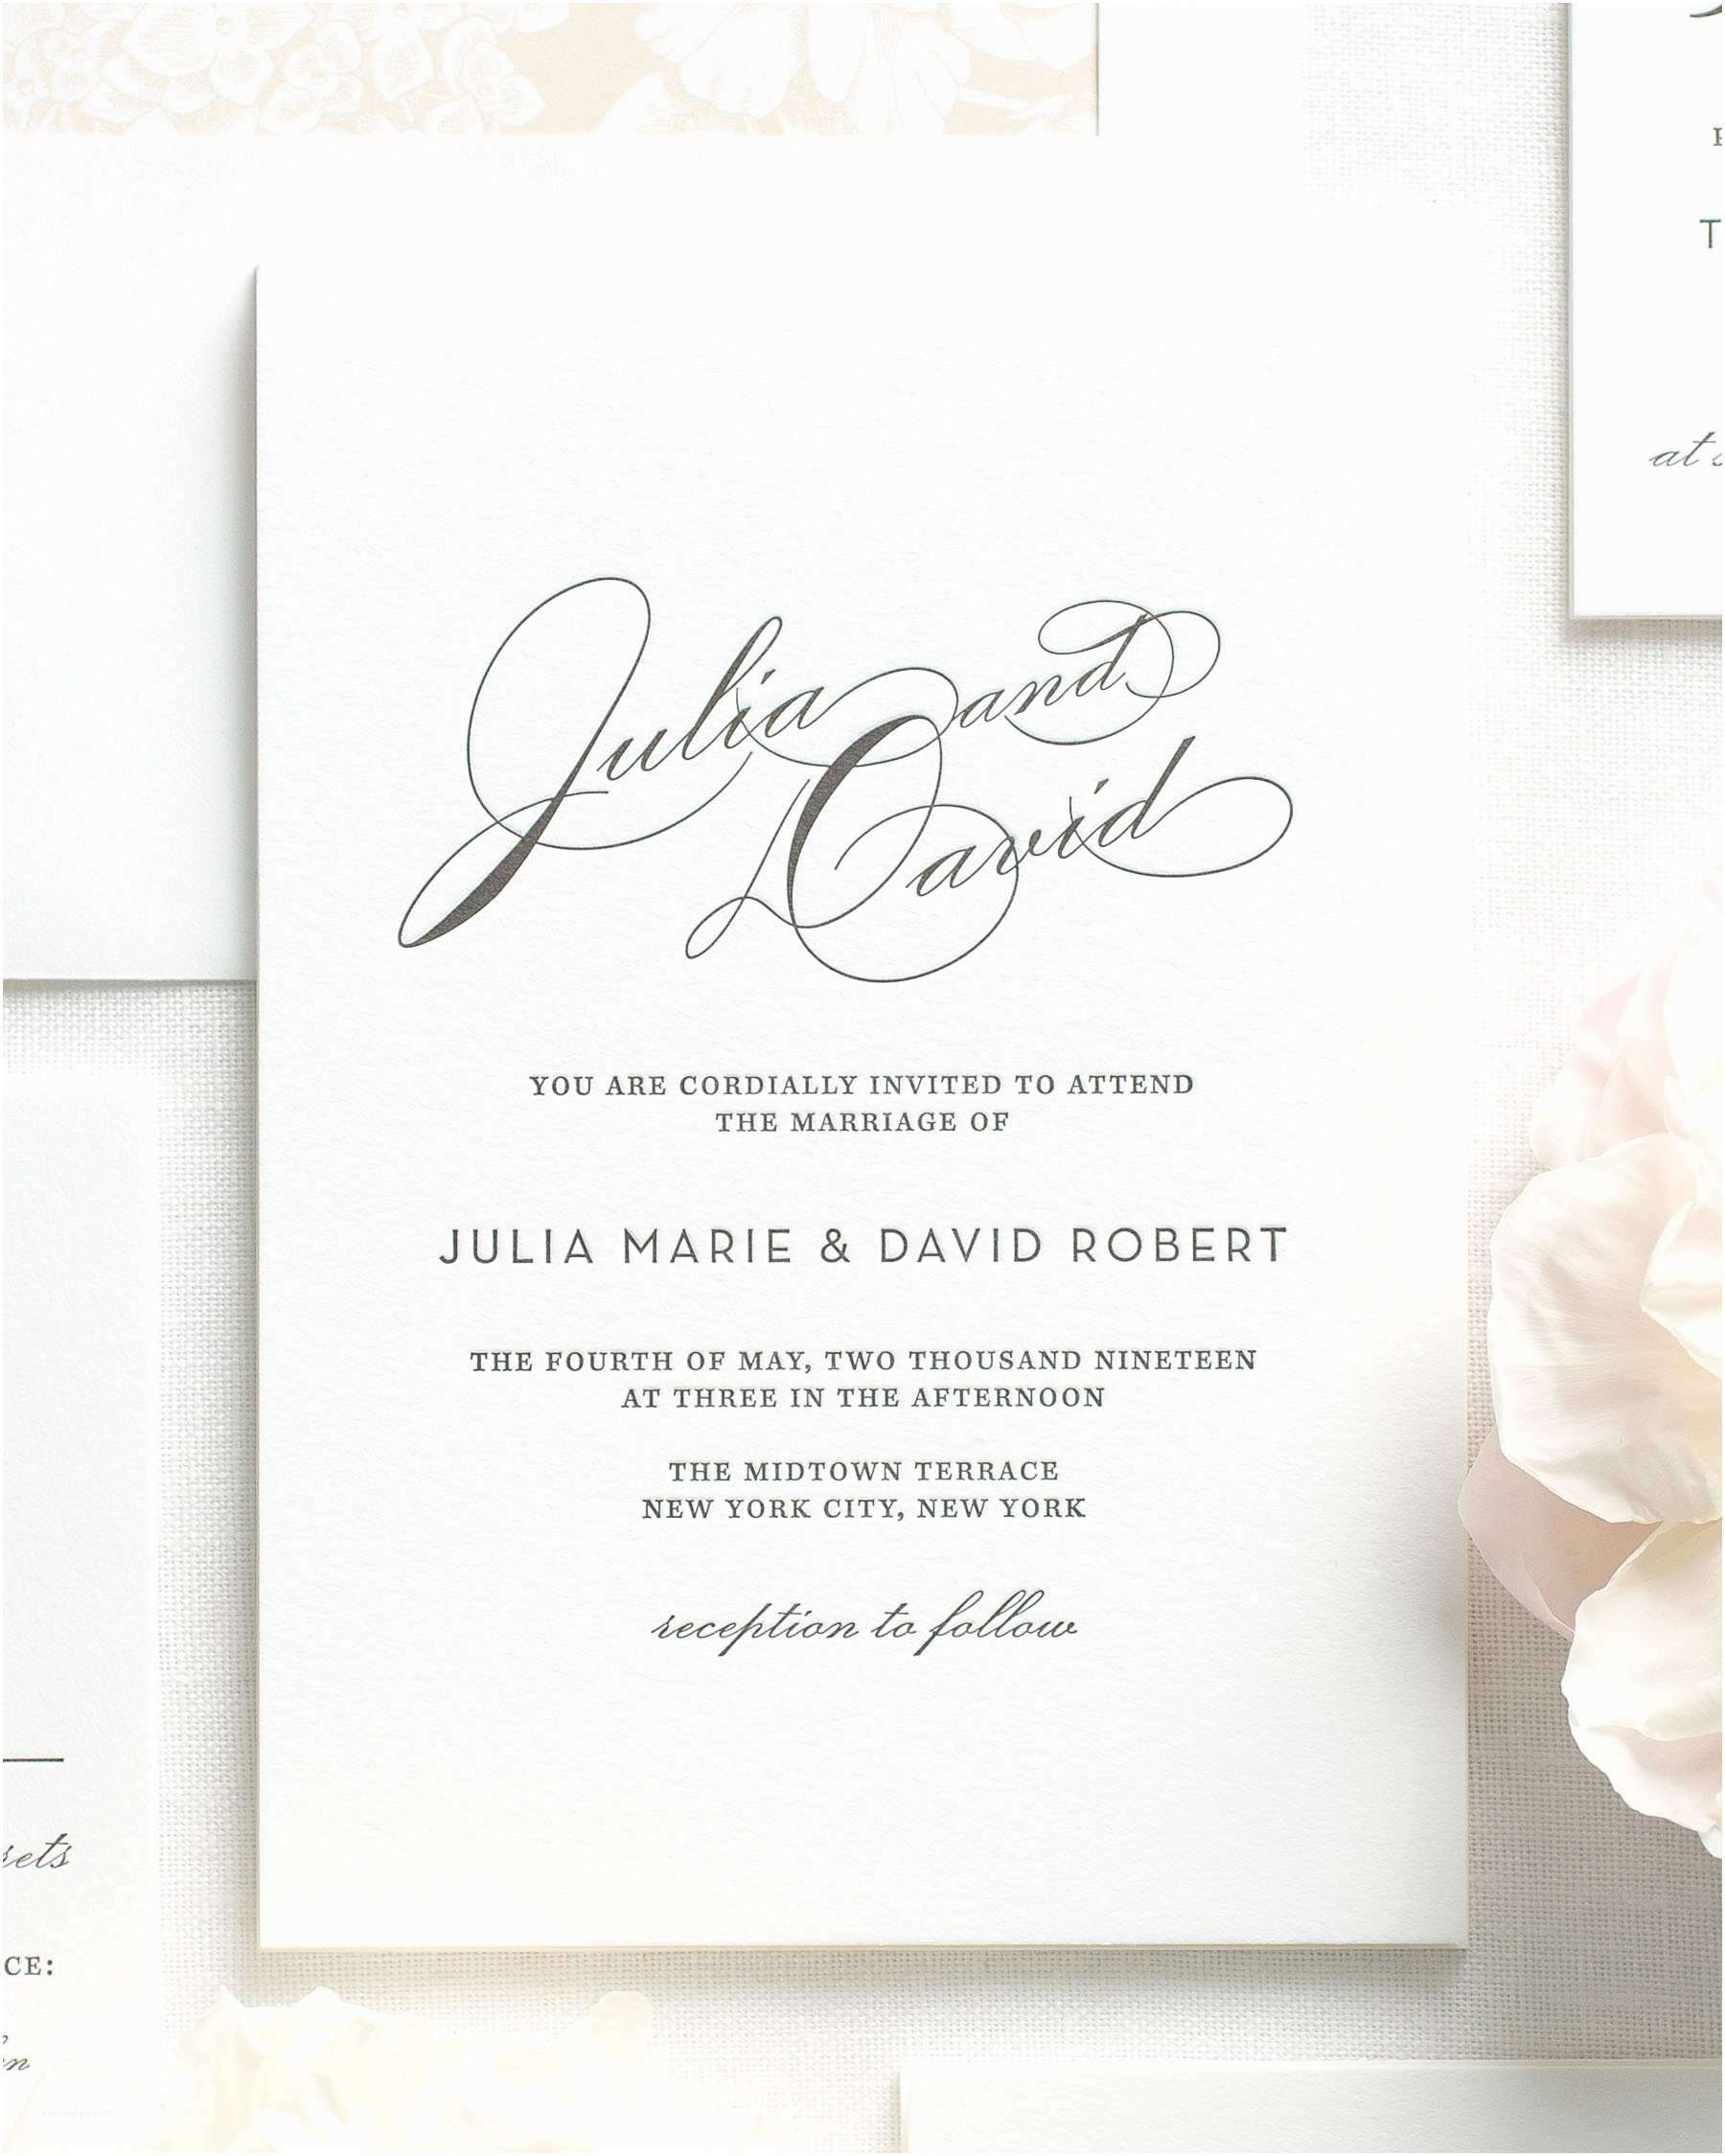 Letterpress Wedding Invitations Vintage Glam Letterpress Wedding Invitations Letterpress